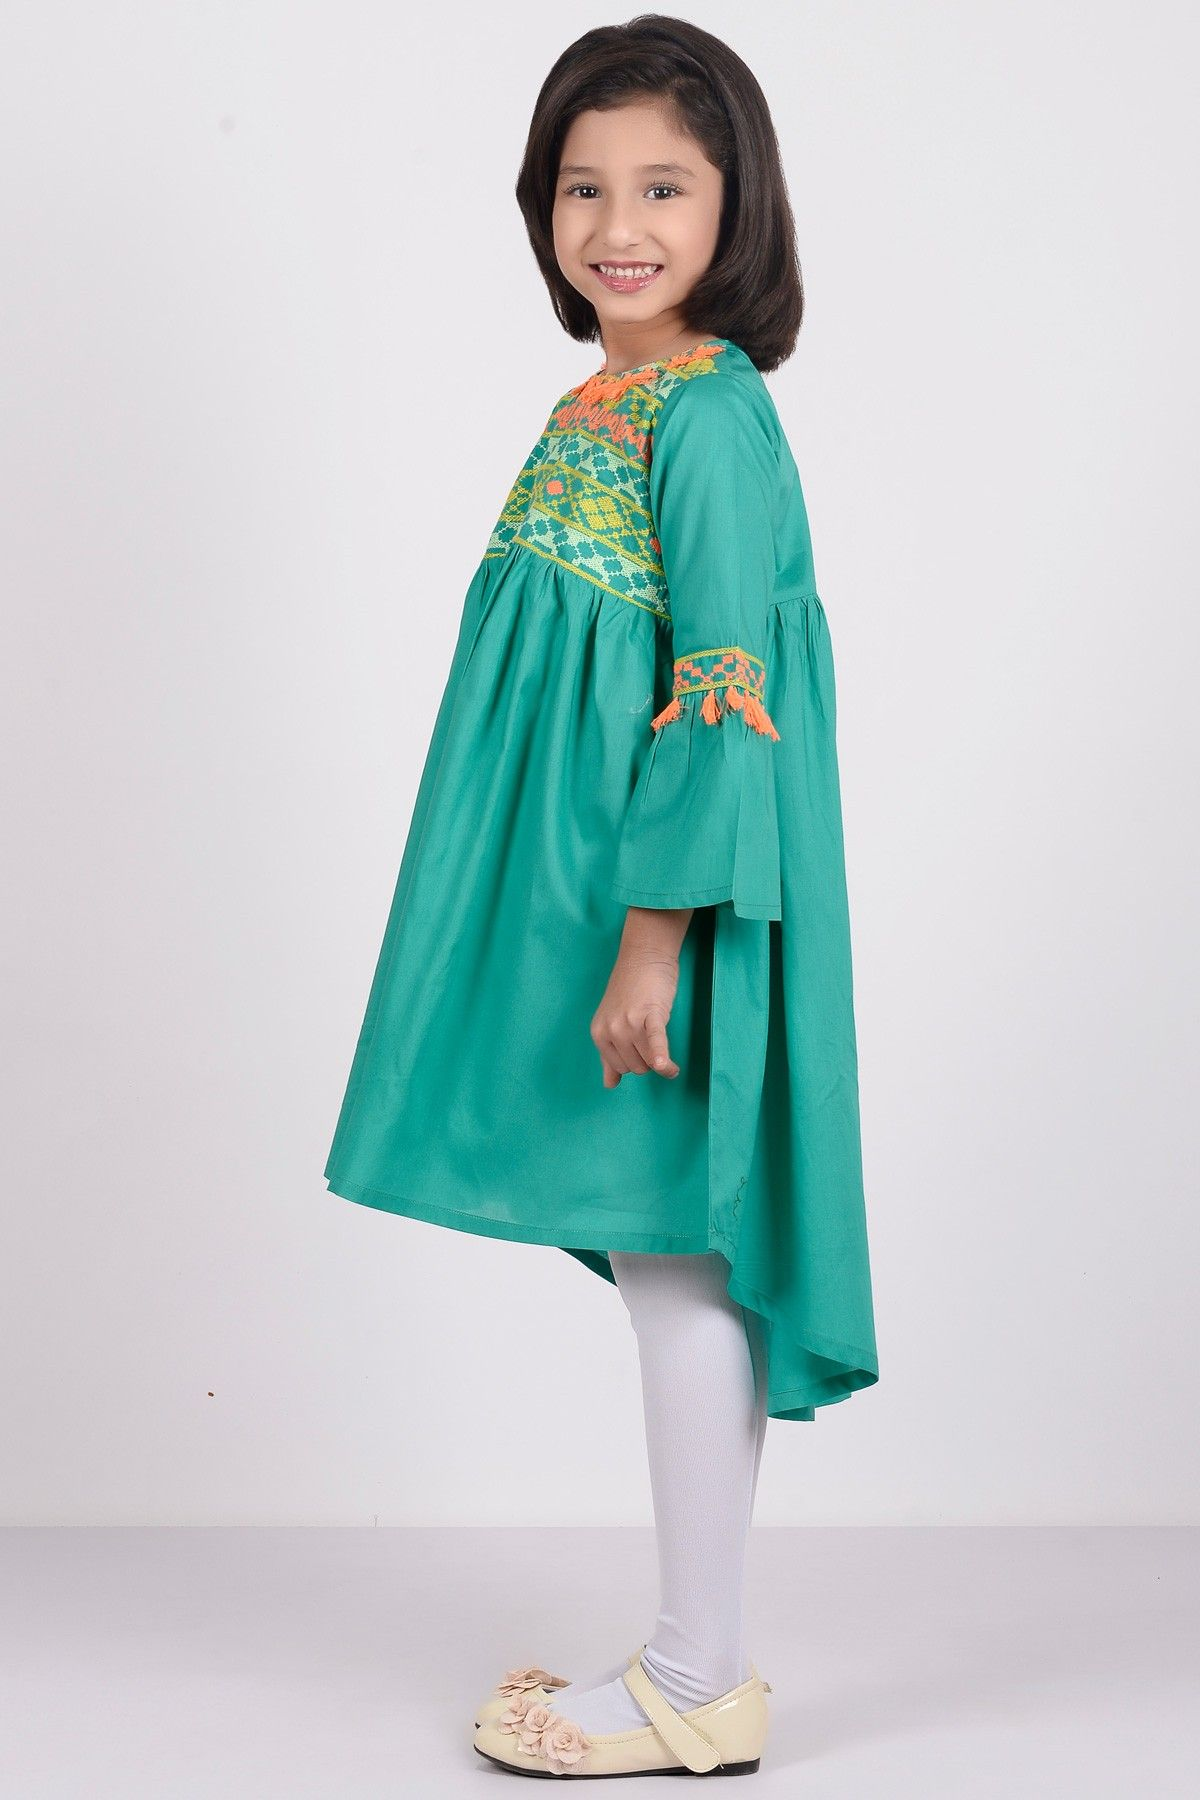 Khaadi - Embroidered Dress - Kids | Khadi | Pinterest | Girls ...